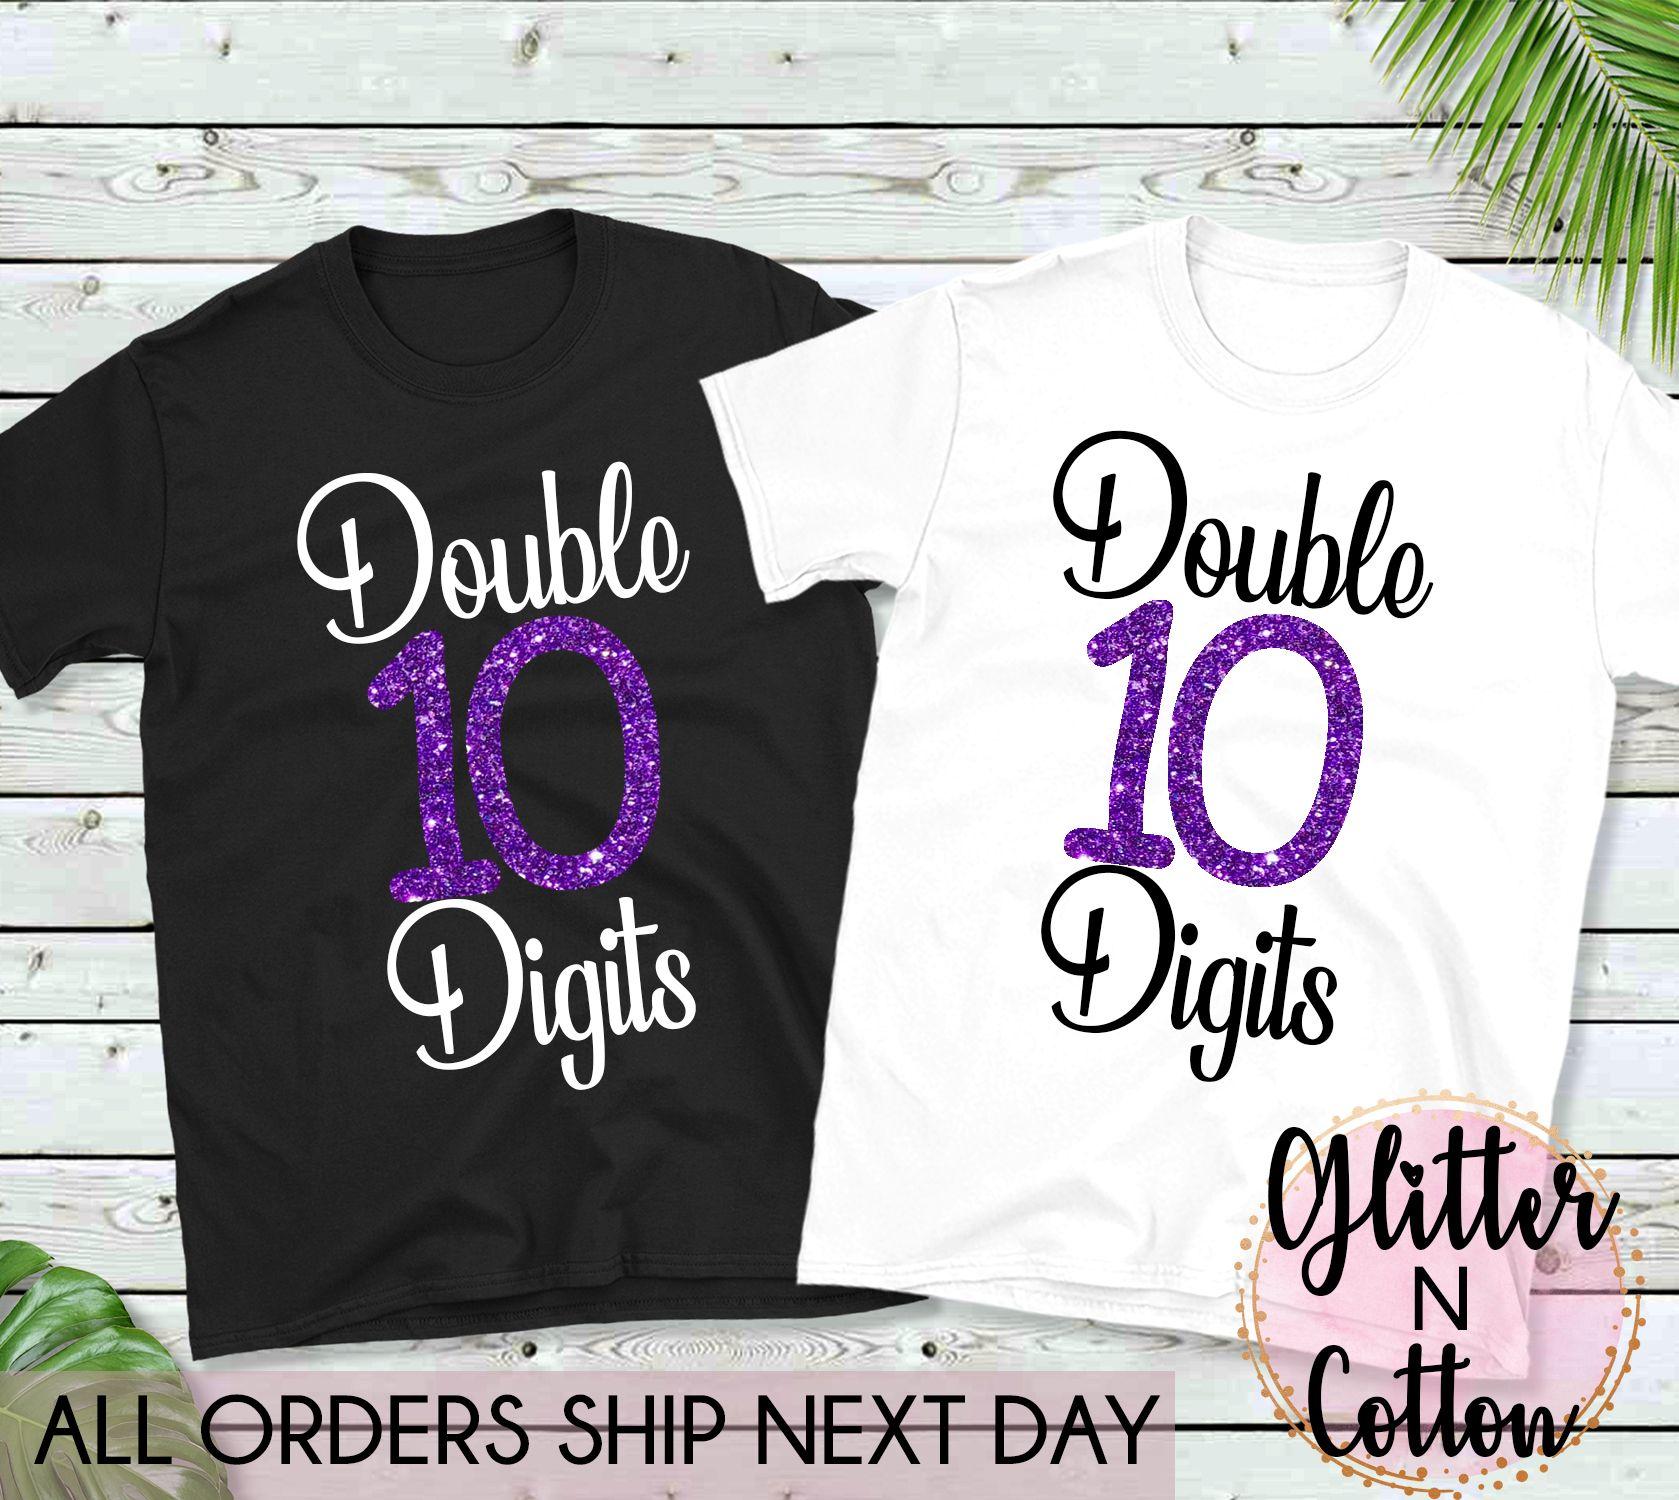 ec441b2f 10th Birthday shirt for girls, custom printed shirts for women and girls